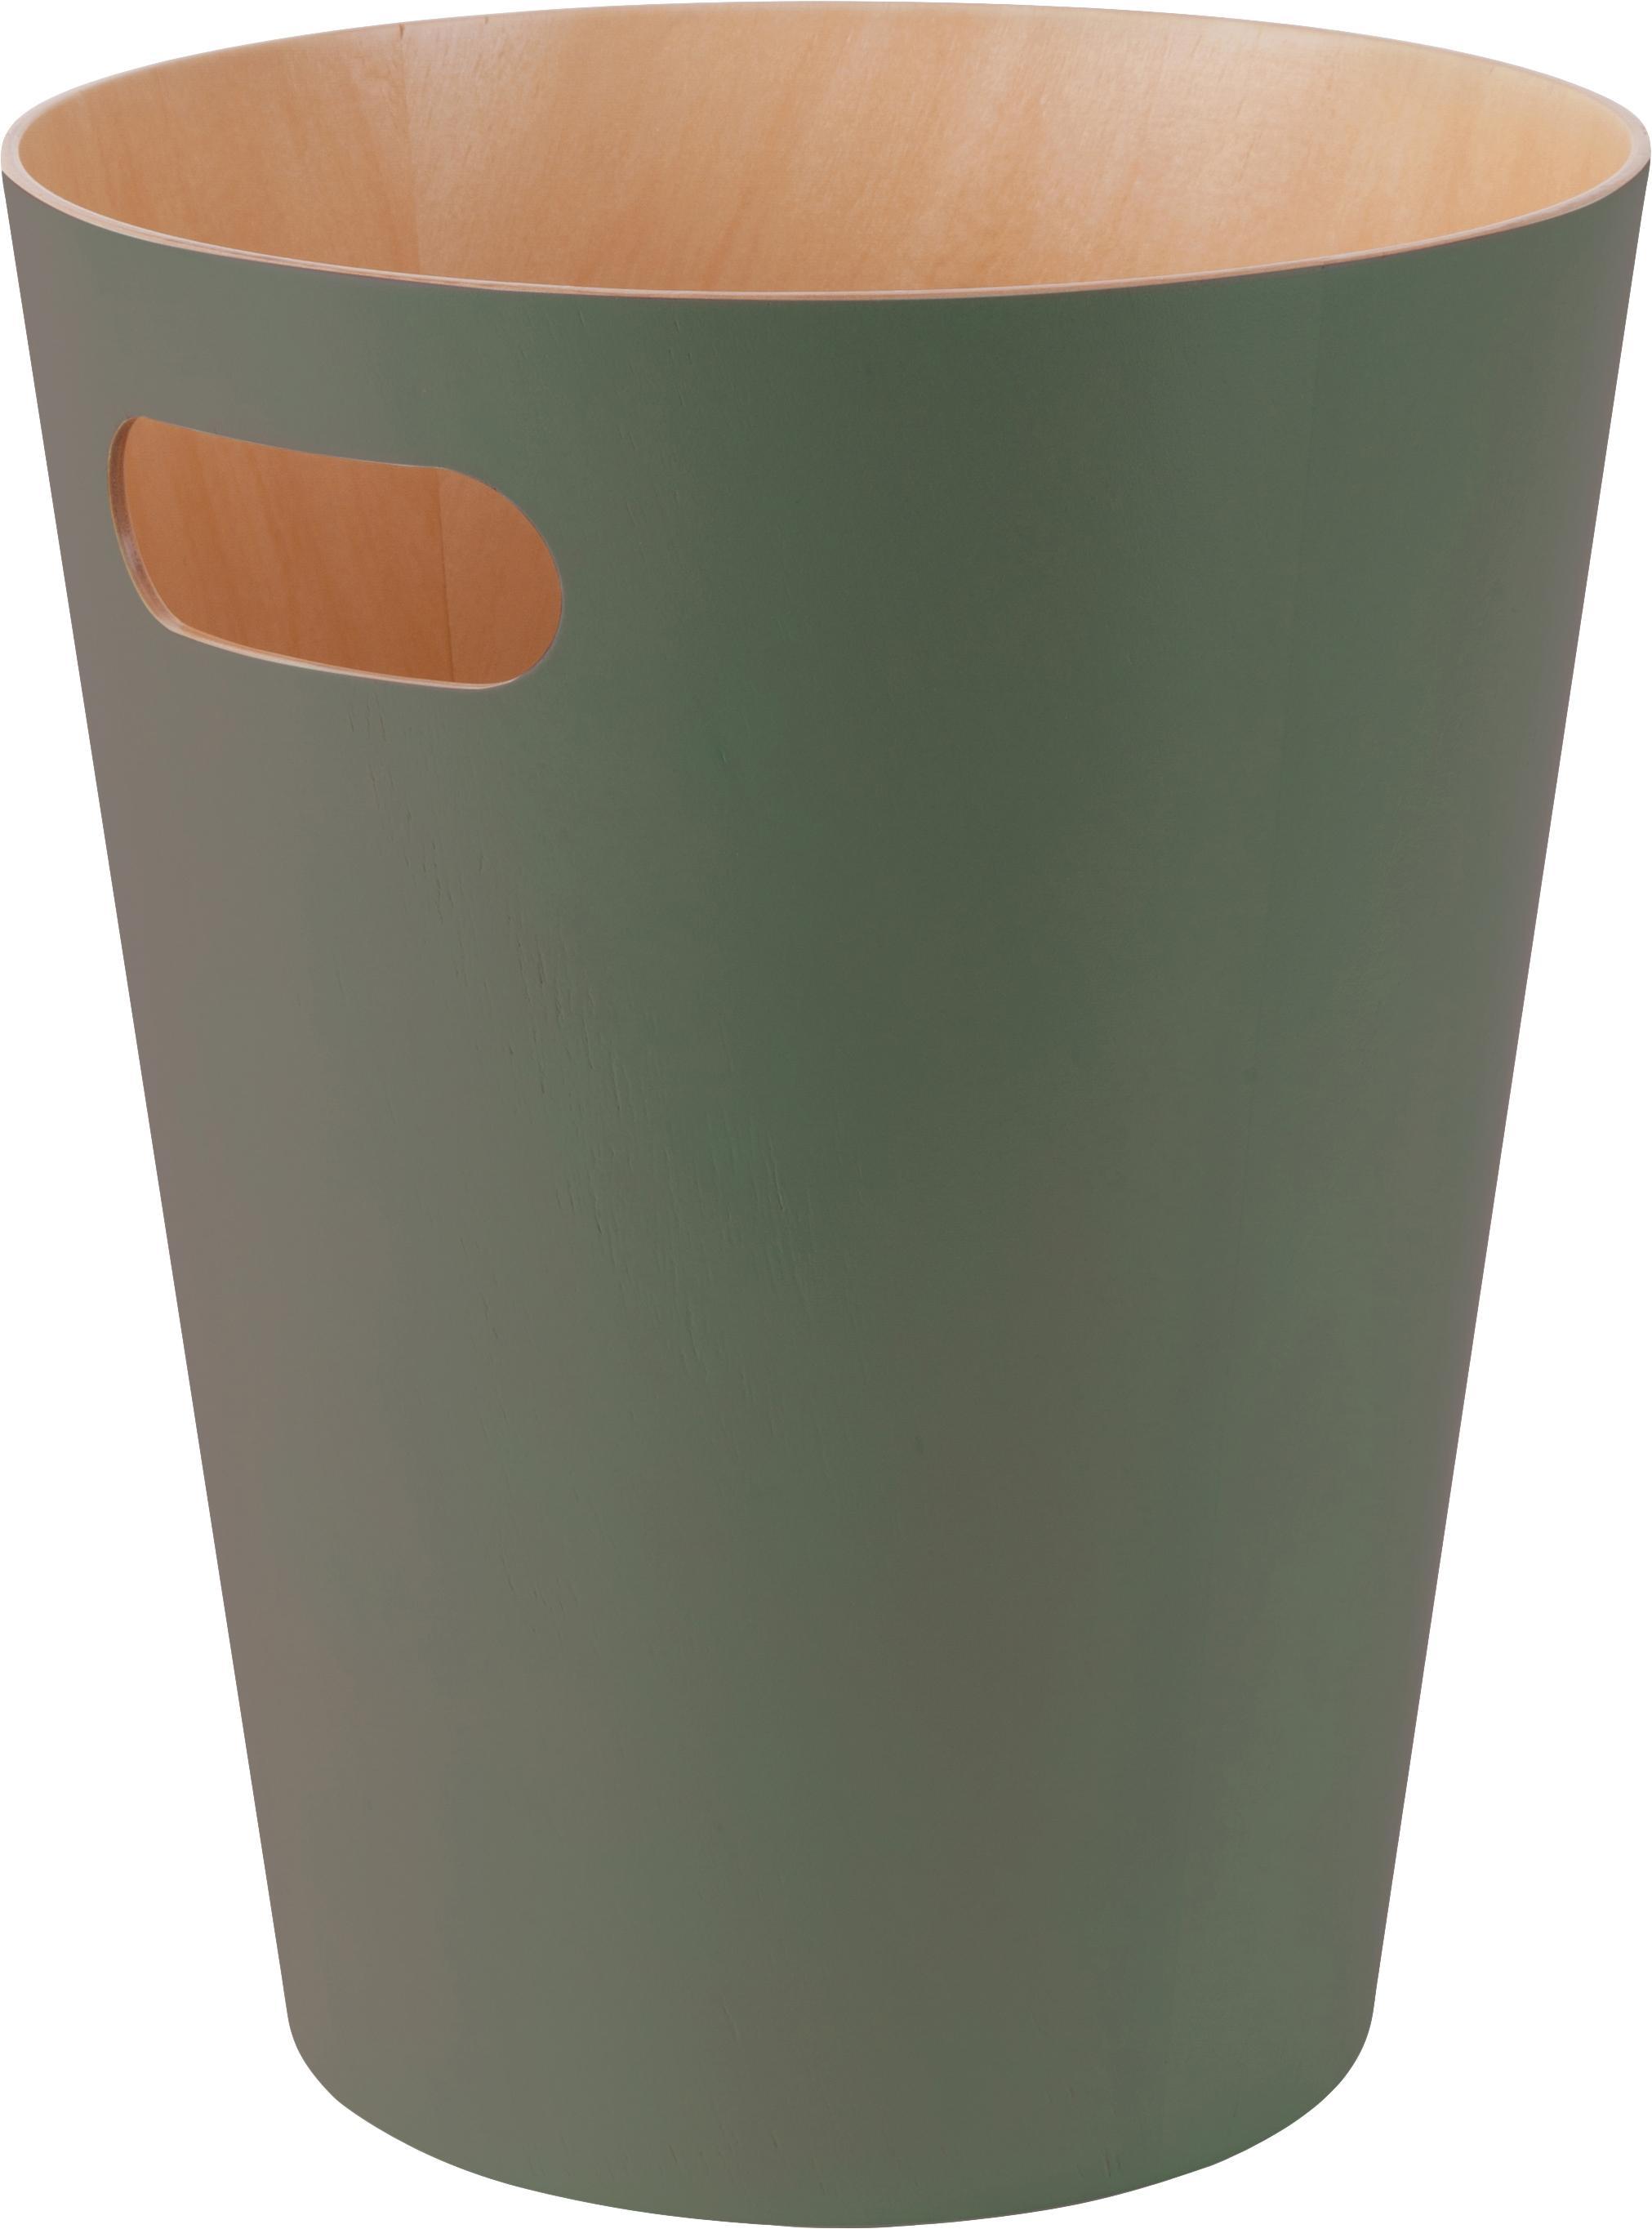 Papelera Woodrow Can, Madera, pintada, Verde oliva, Ø 23 x Al 28 cm